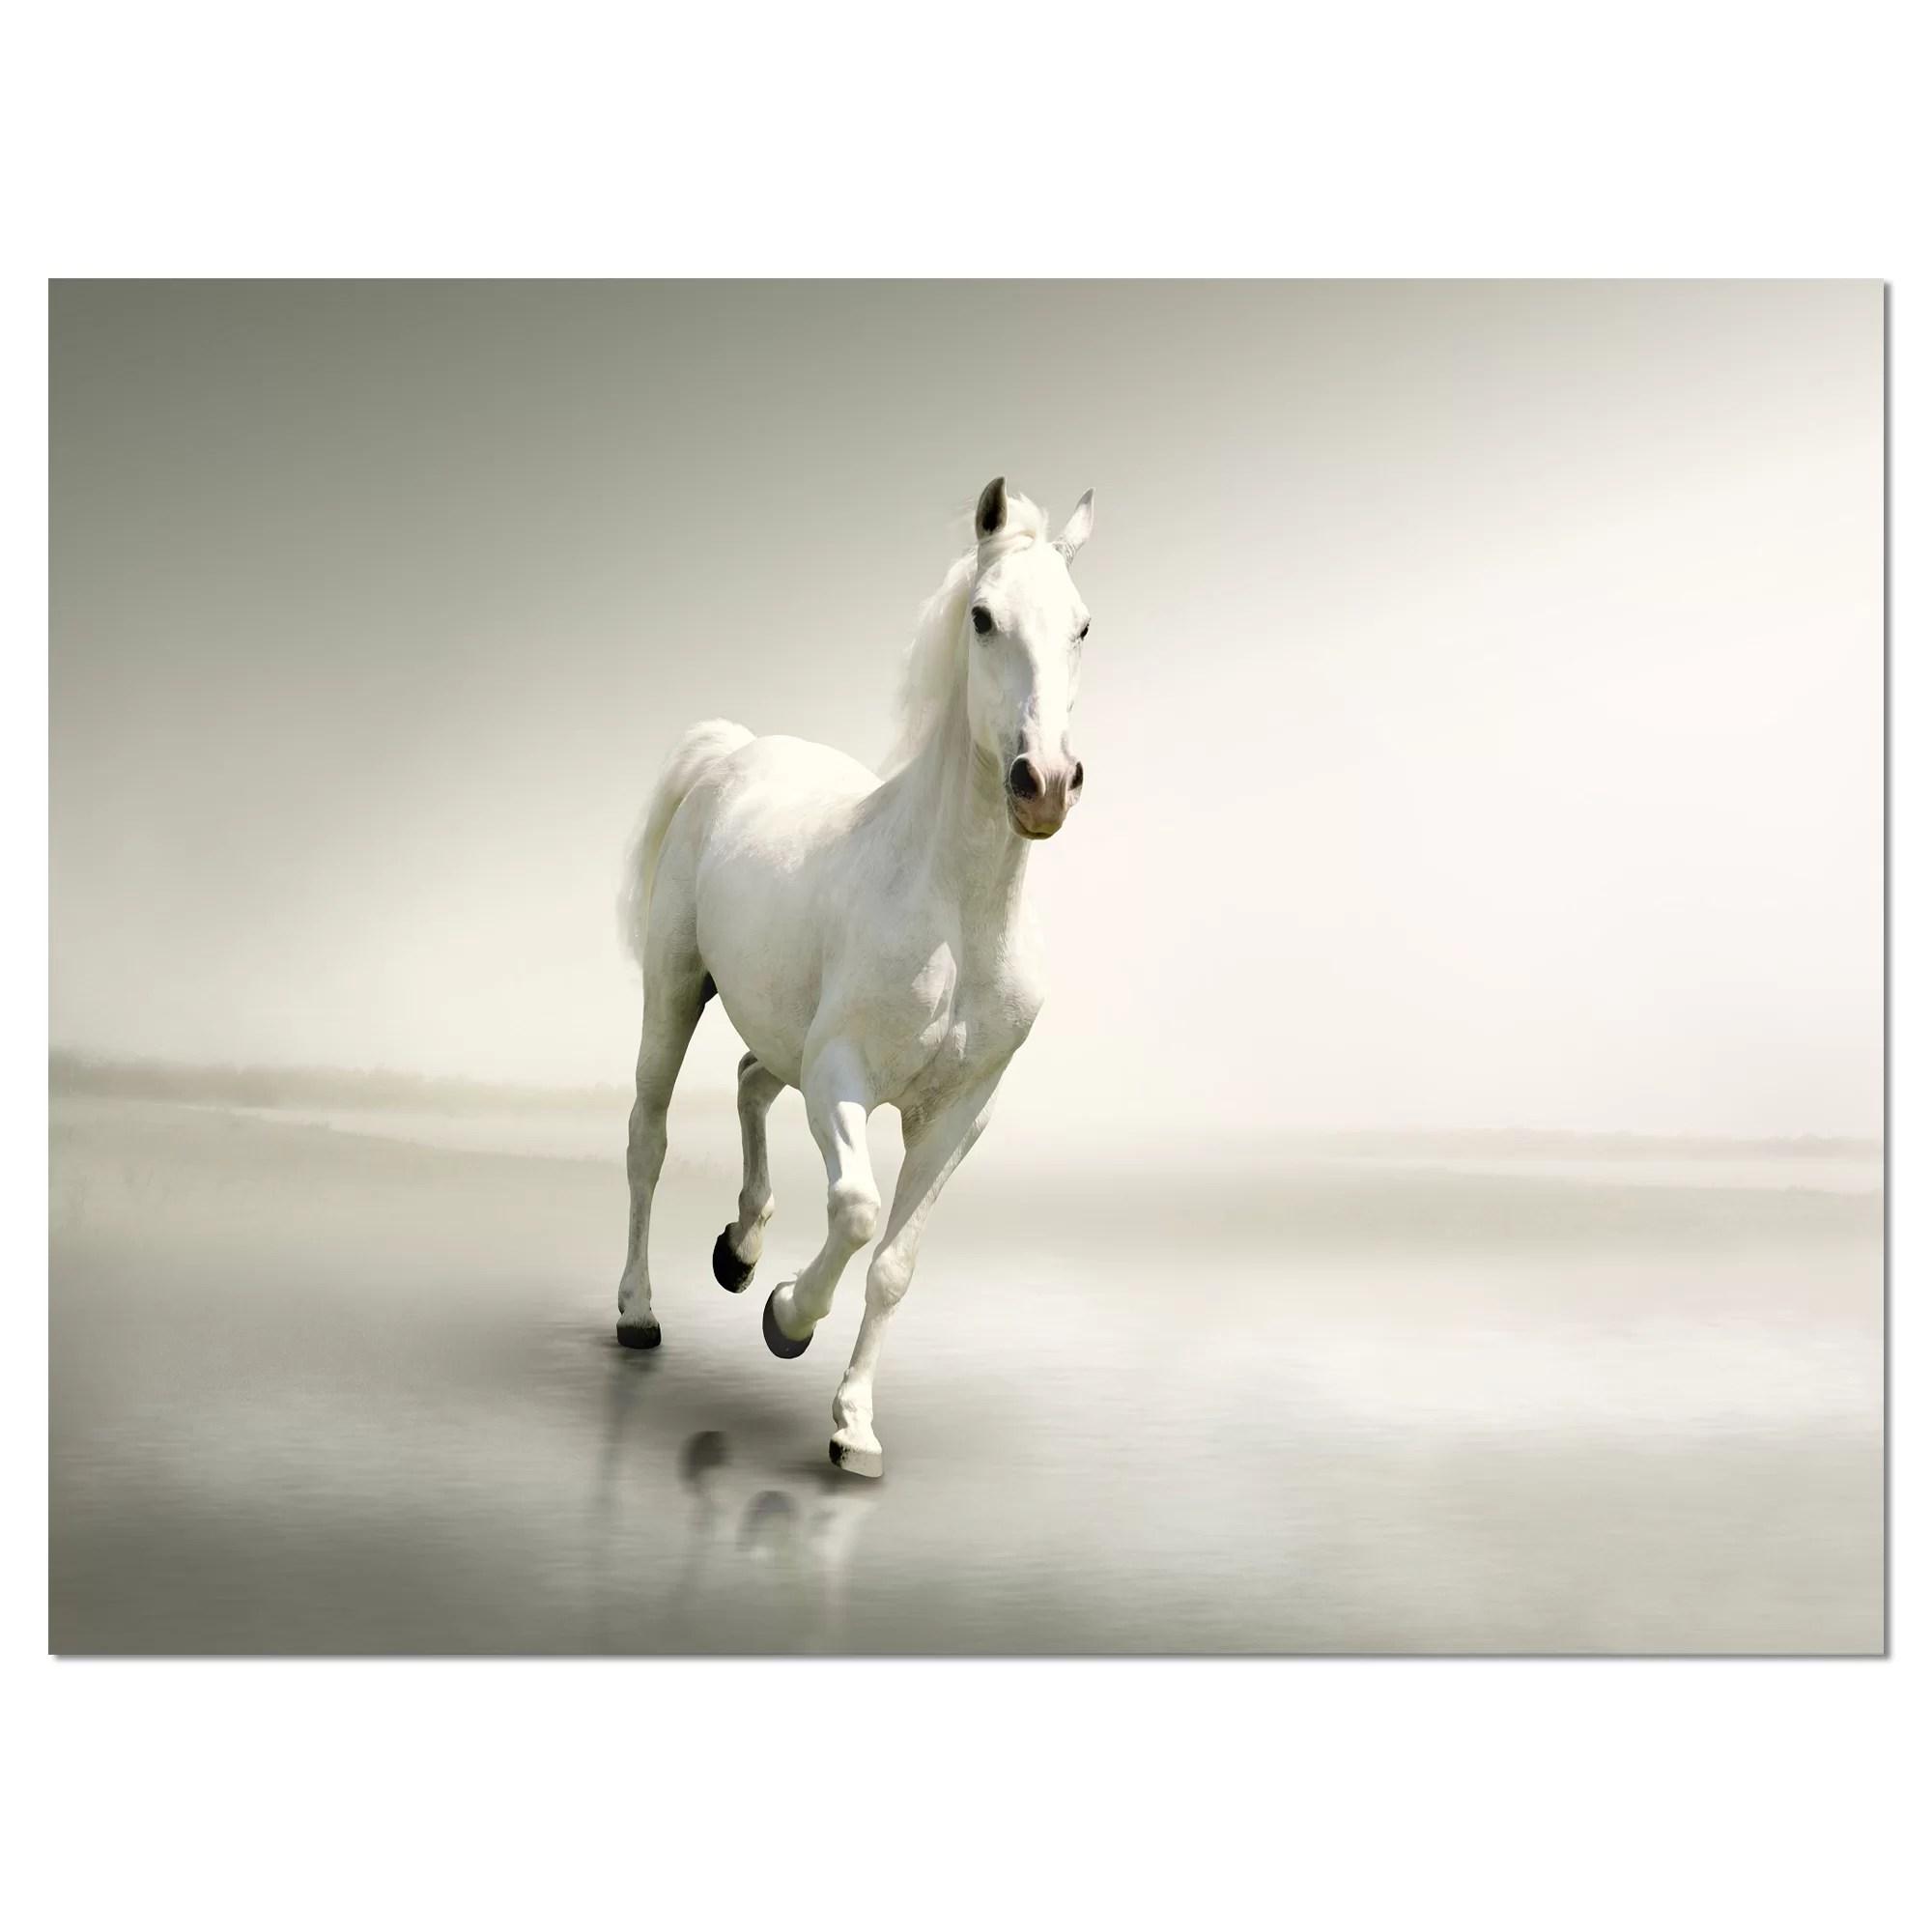 Orren Ellis Beautiful White Horse Running Photographic Print On Wrapped Canvas Wayfair